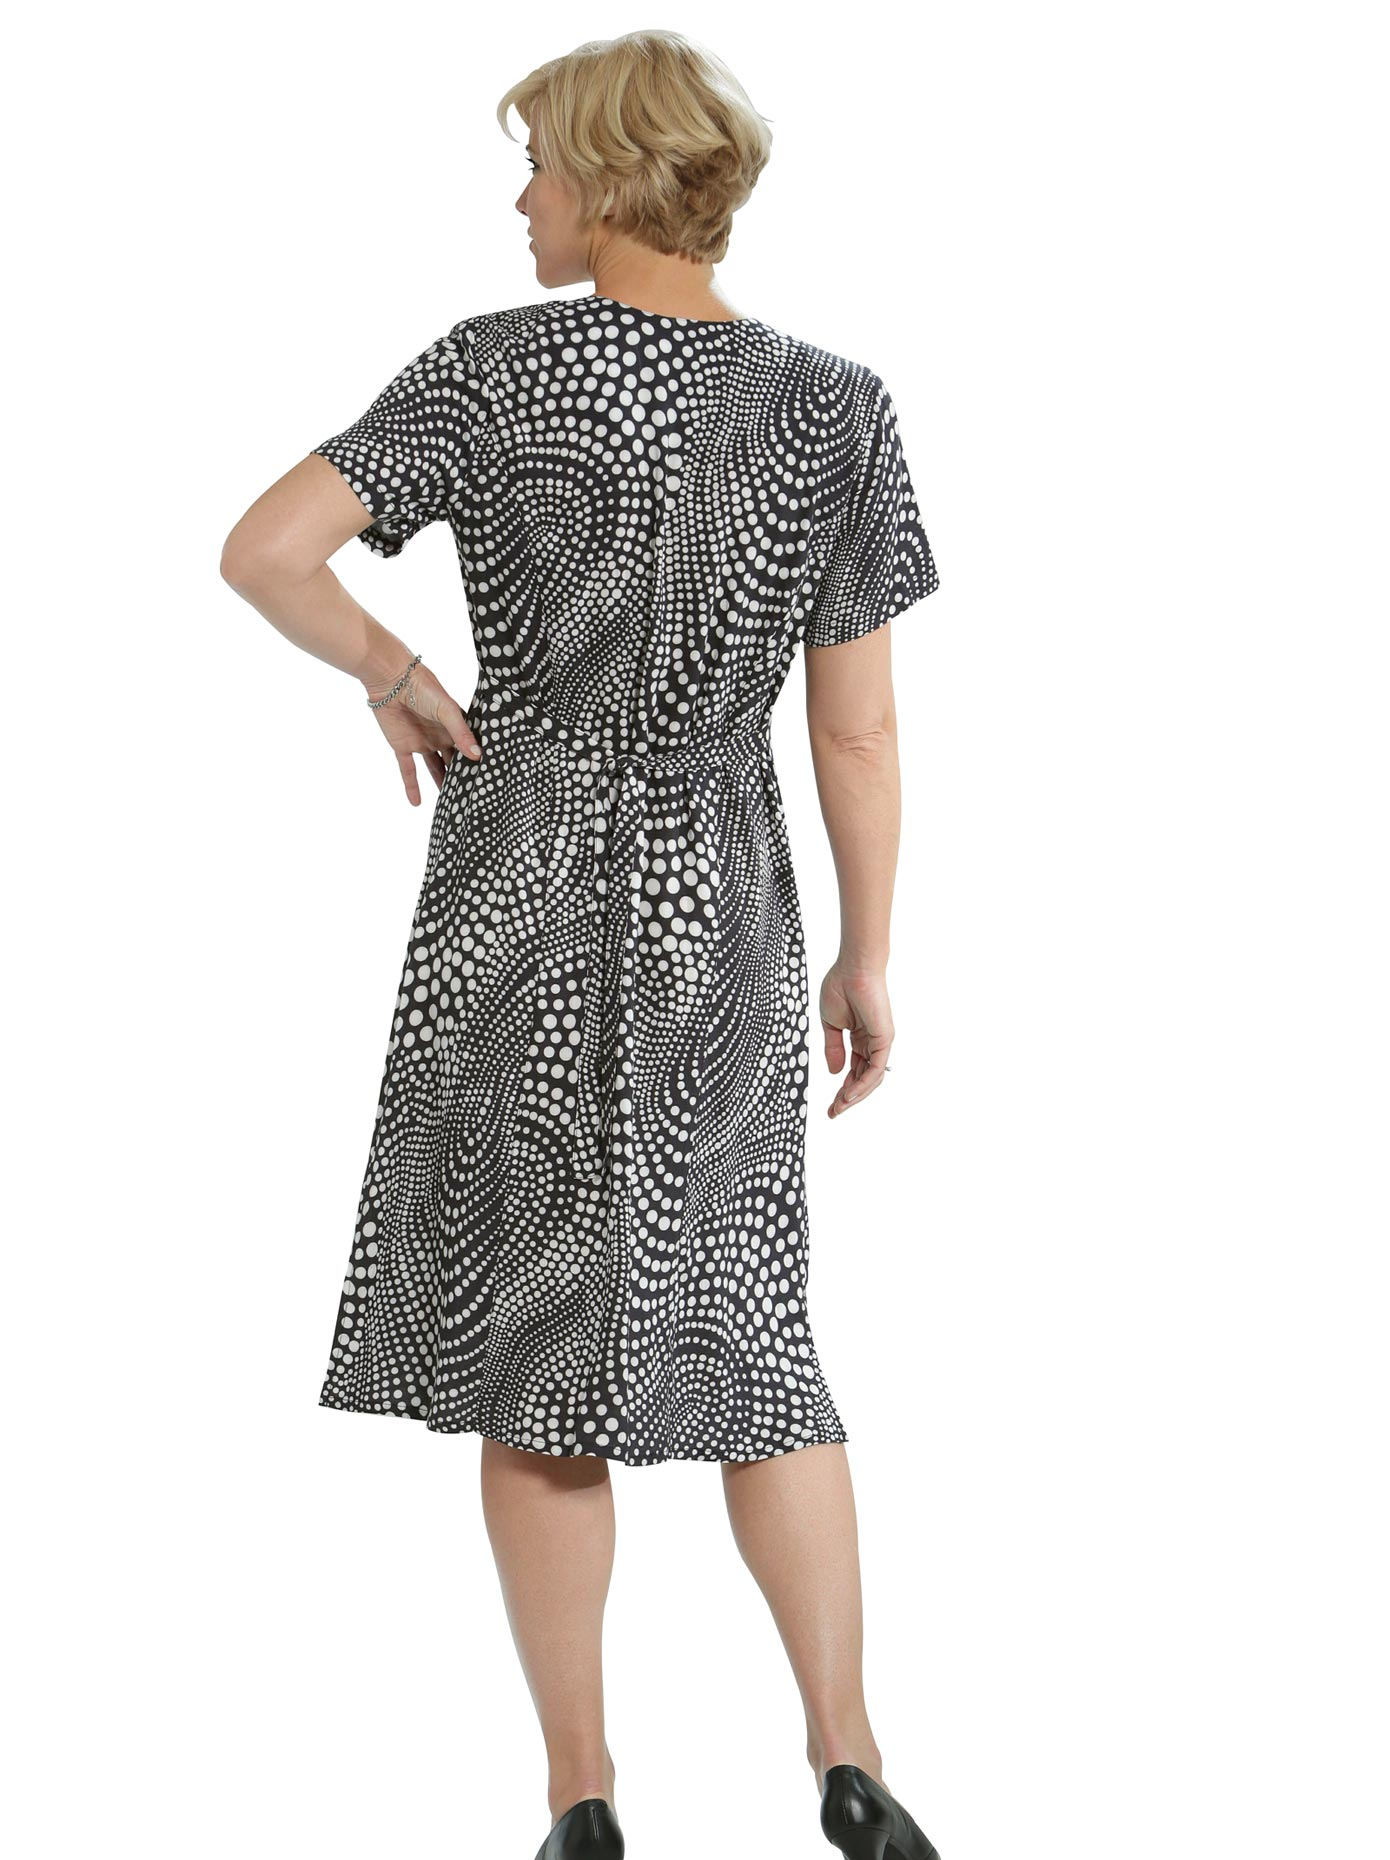 Classic Basics Kleid im Punkte-Look